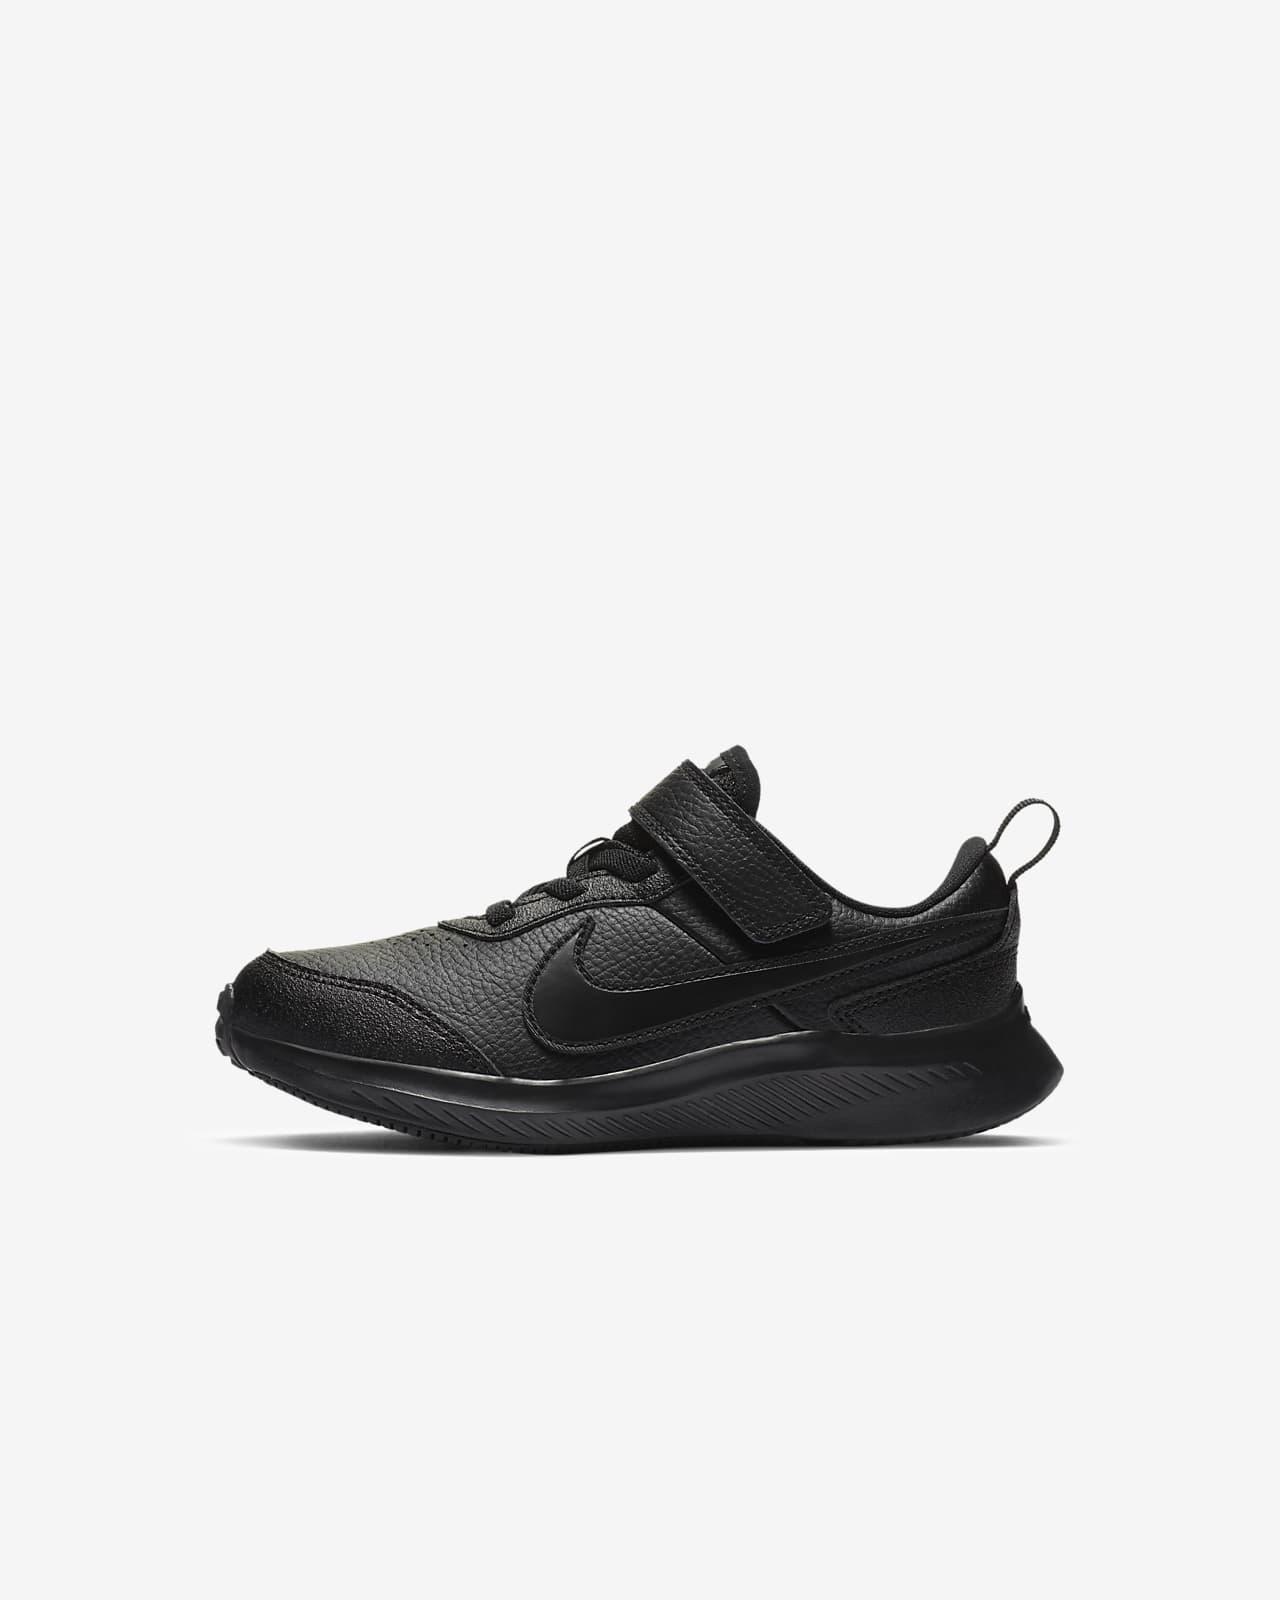 Nike Varsity Younger Kids' Shoe. Nike SG